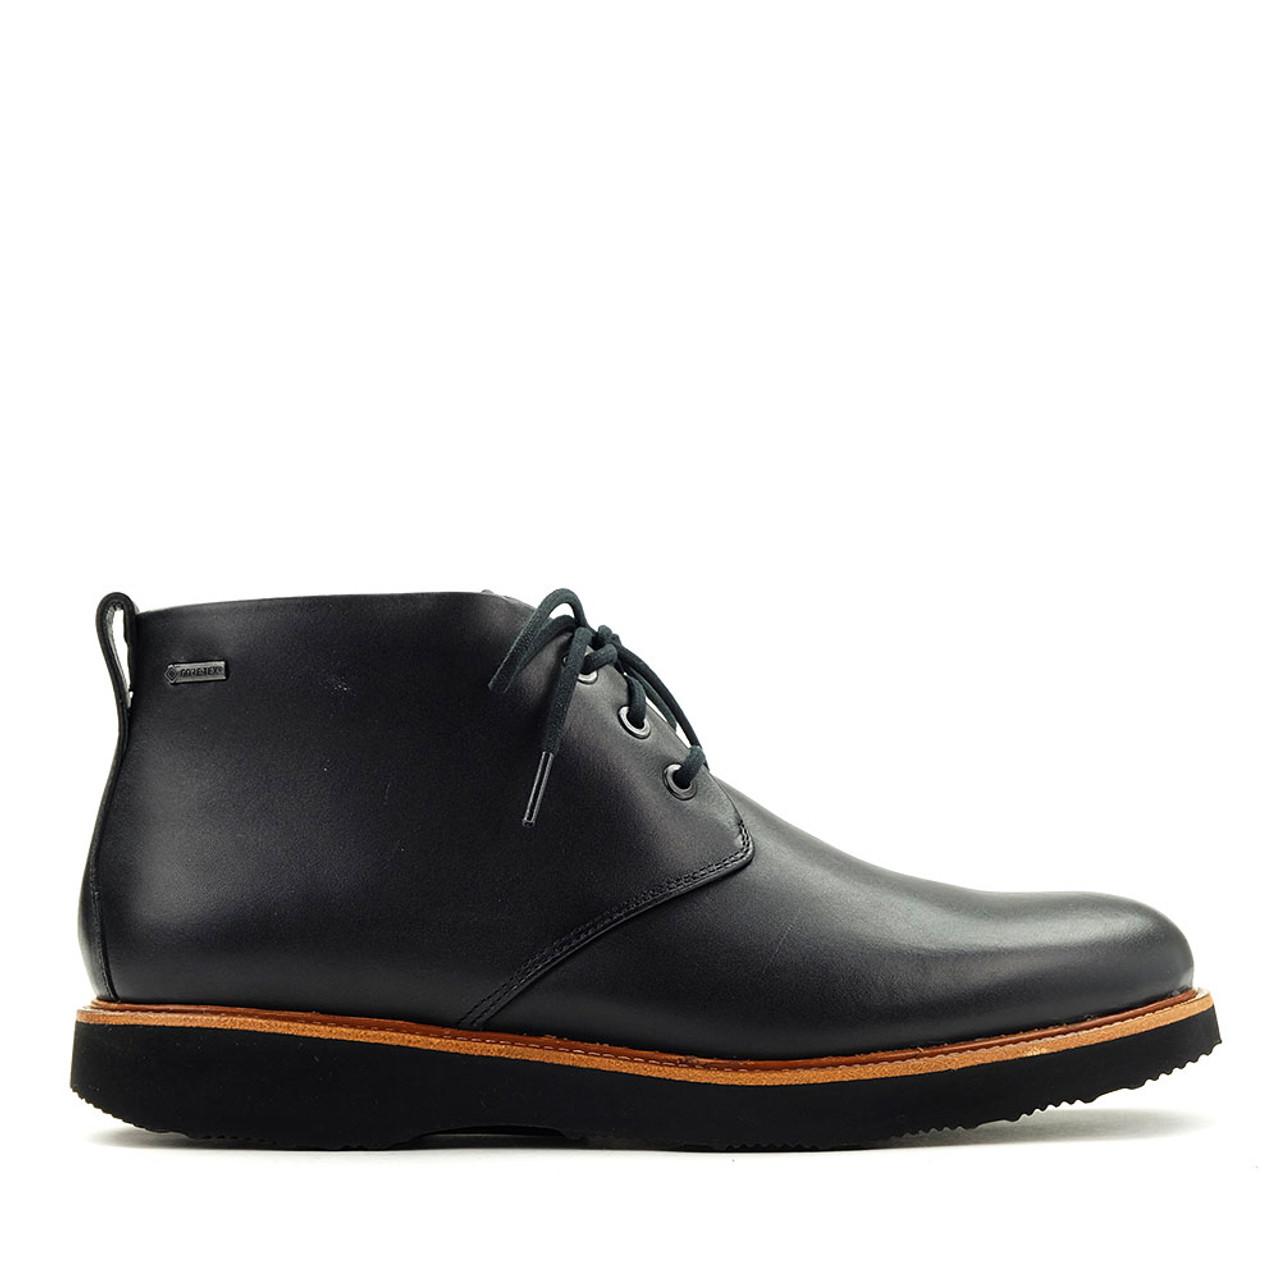 Rainy Day Re-Boot Black - Samuel Hubbard at Hanigs Footwear